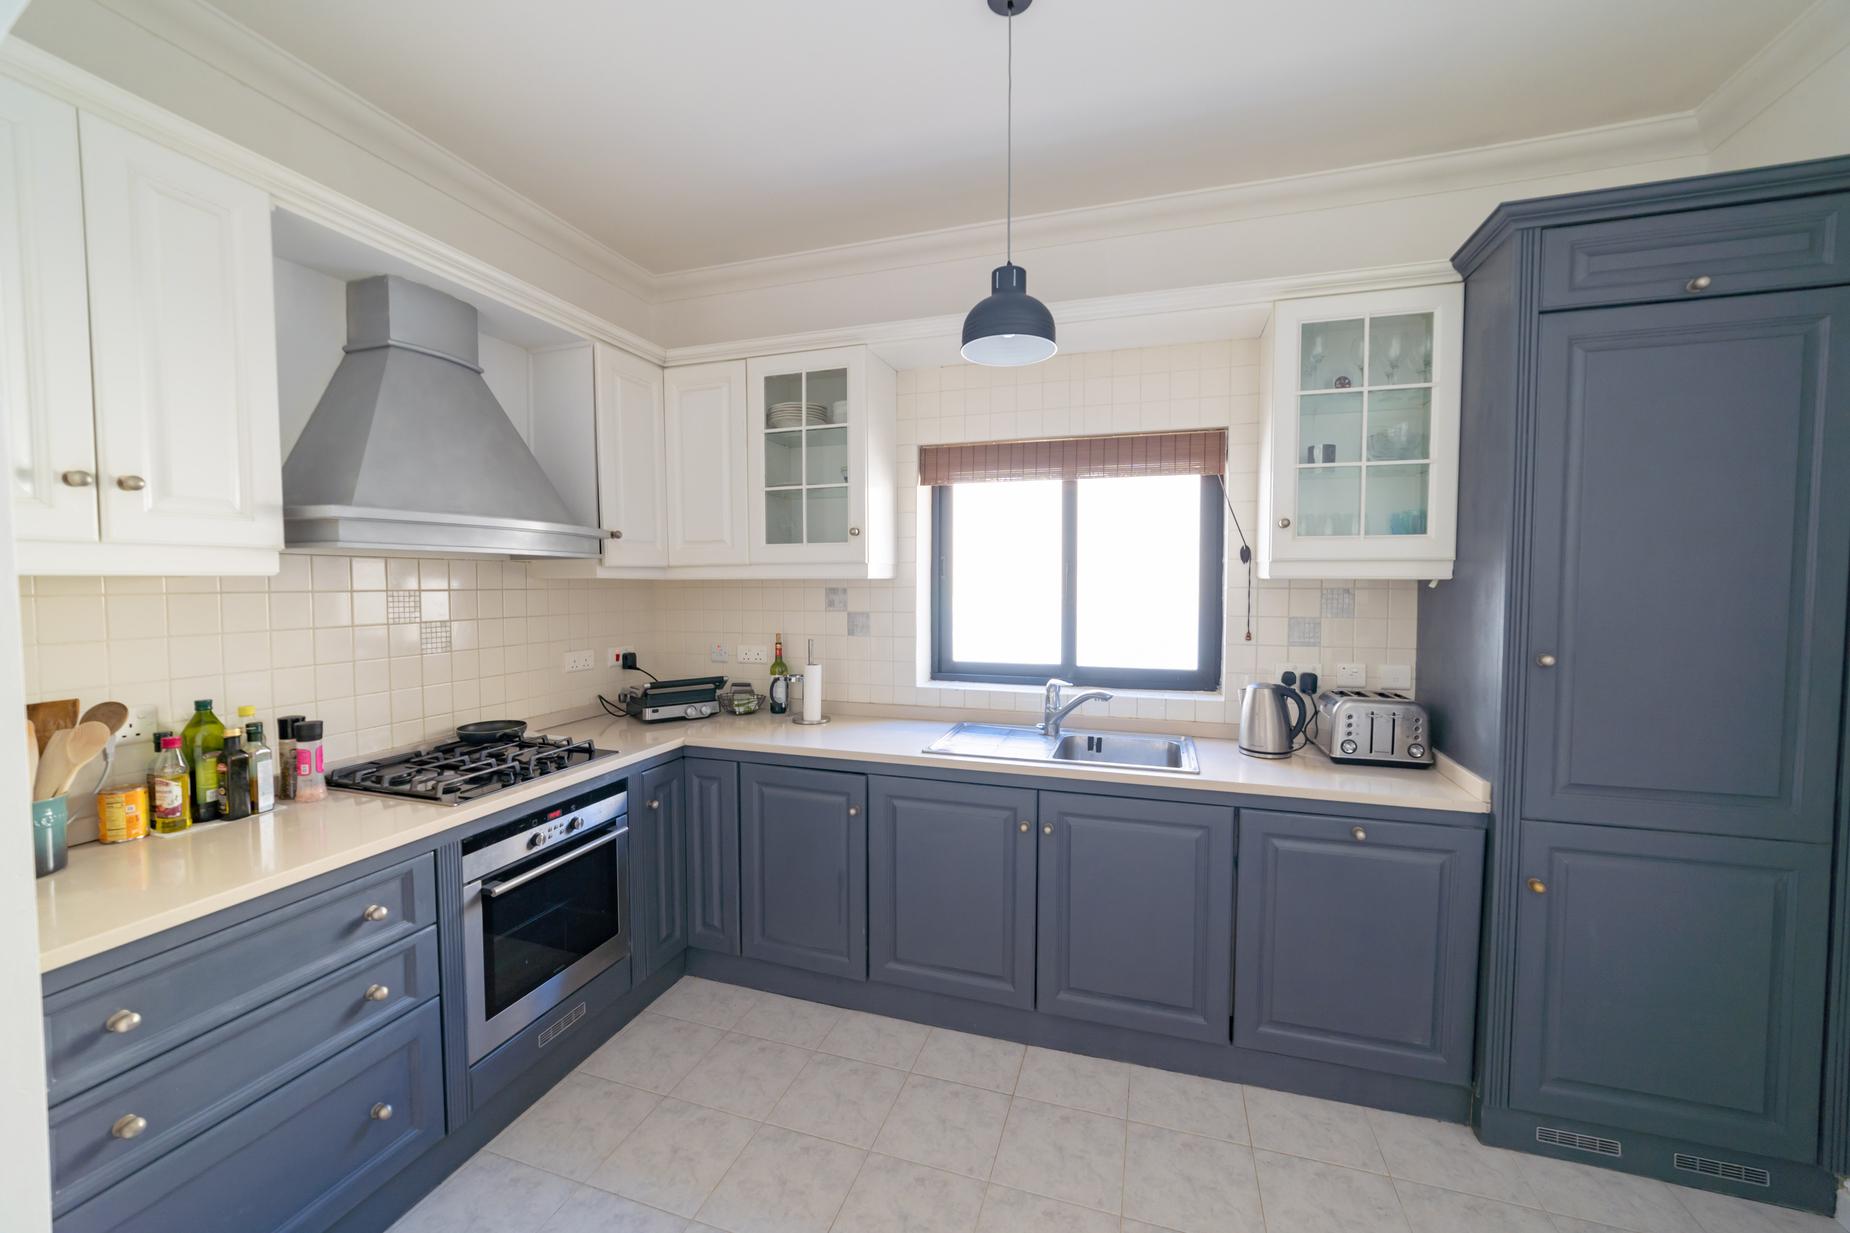 3 bed Apartment For Sale in Naxxar, Naxxar - thumb 3